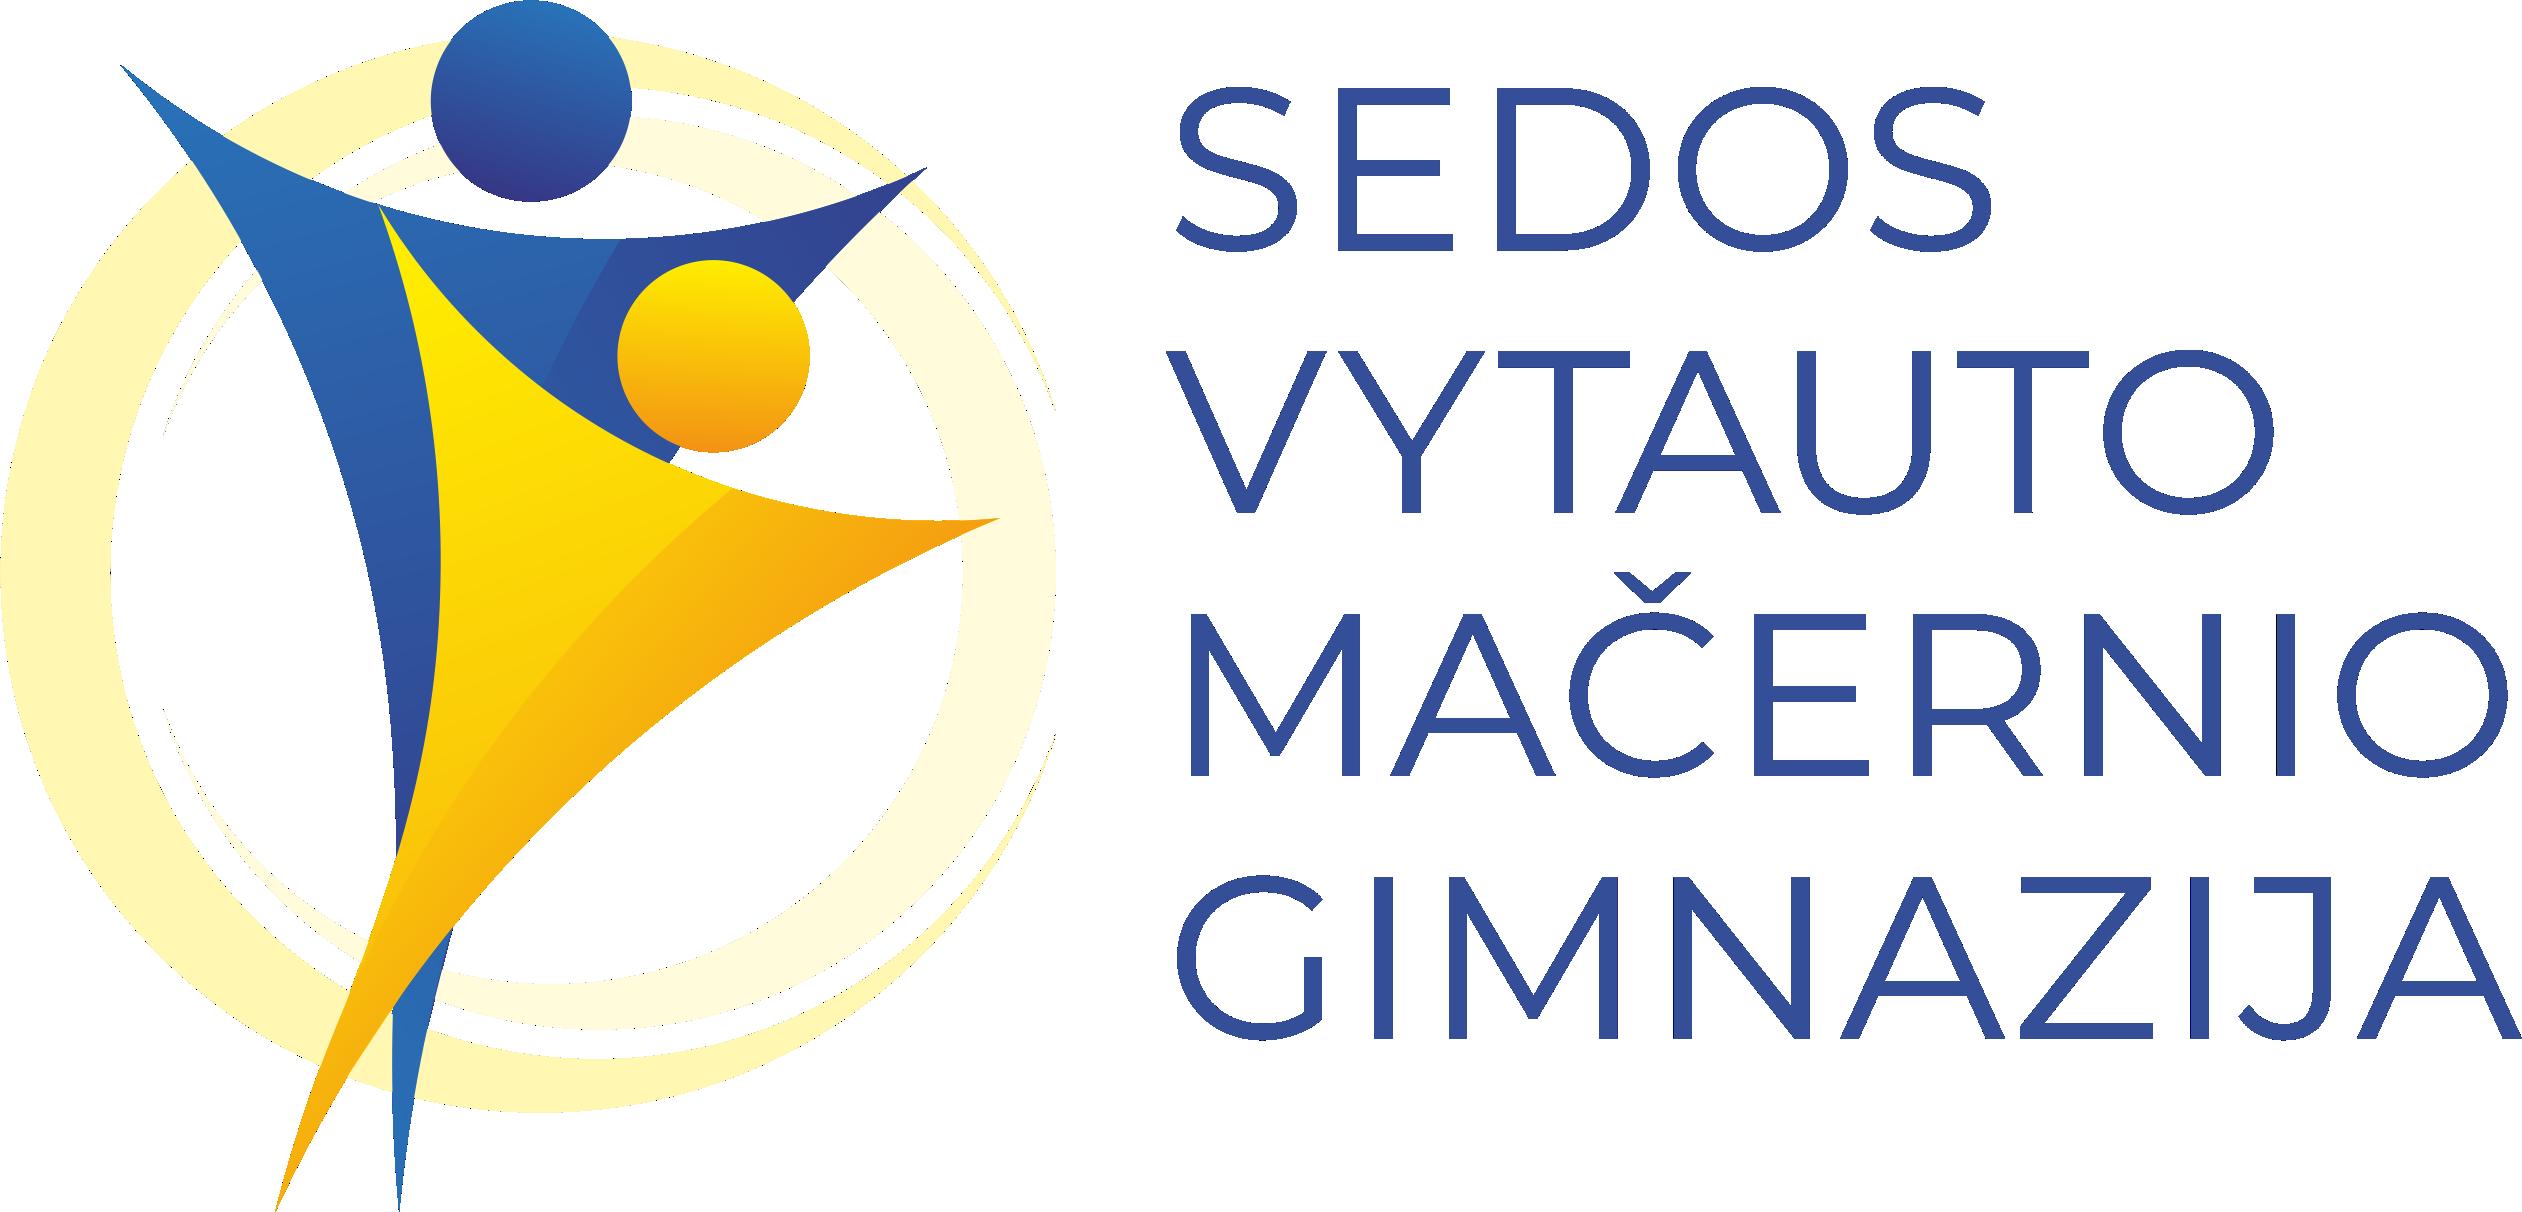 sedos VM gimnazina LOGOTIPAS 2021